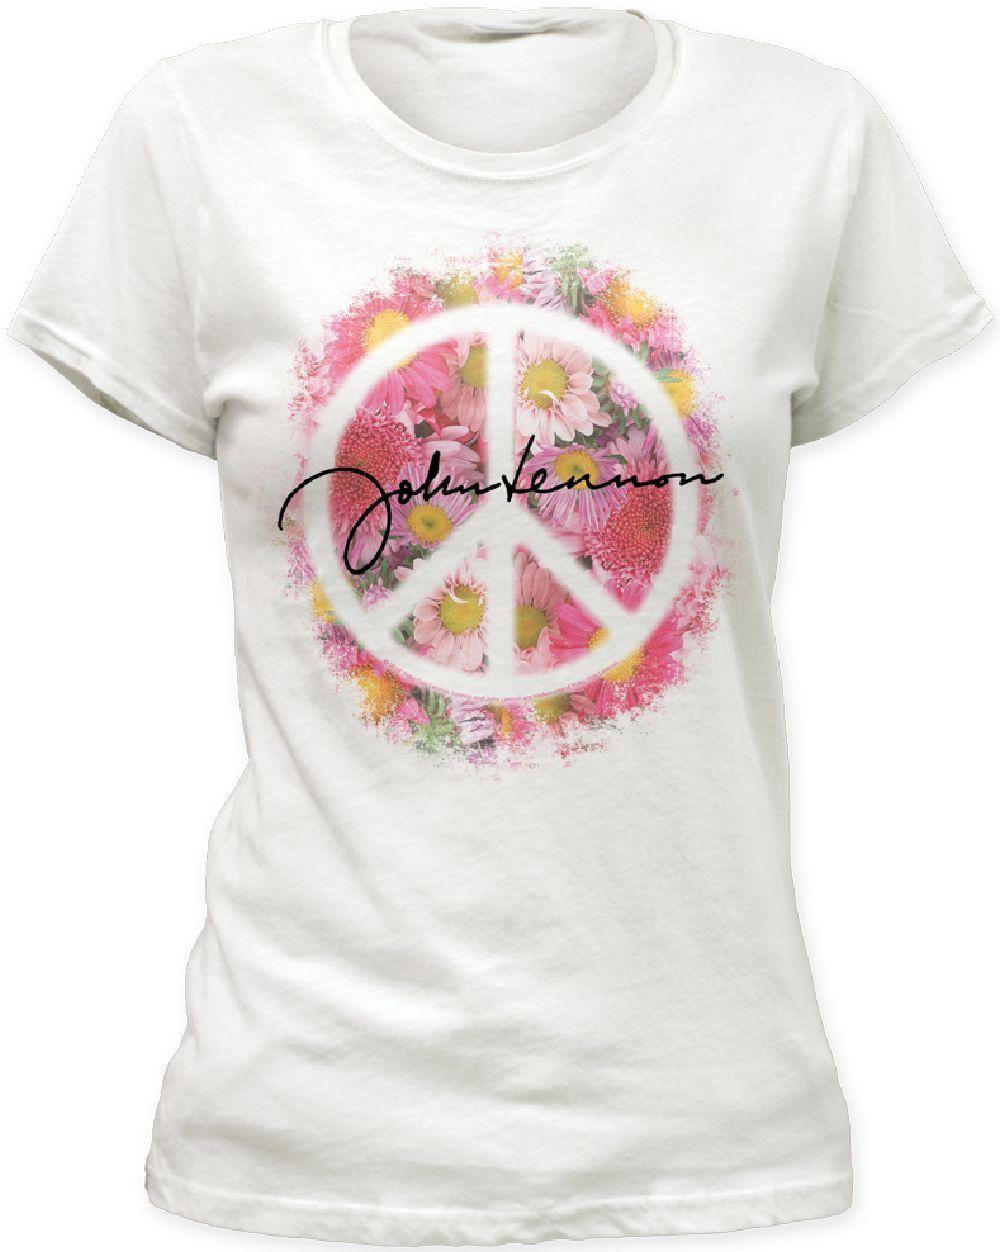 John Lennon Women S T Shirt John Lennon Signature With Flowers And Peace Sign Vintage White Shirt T Shirts For Women T Shirts Uk Ladies Tops Fashion